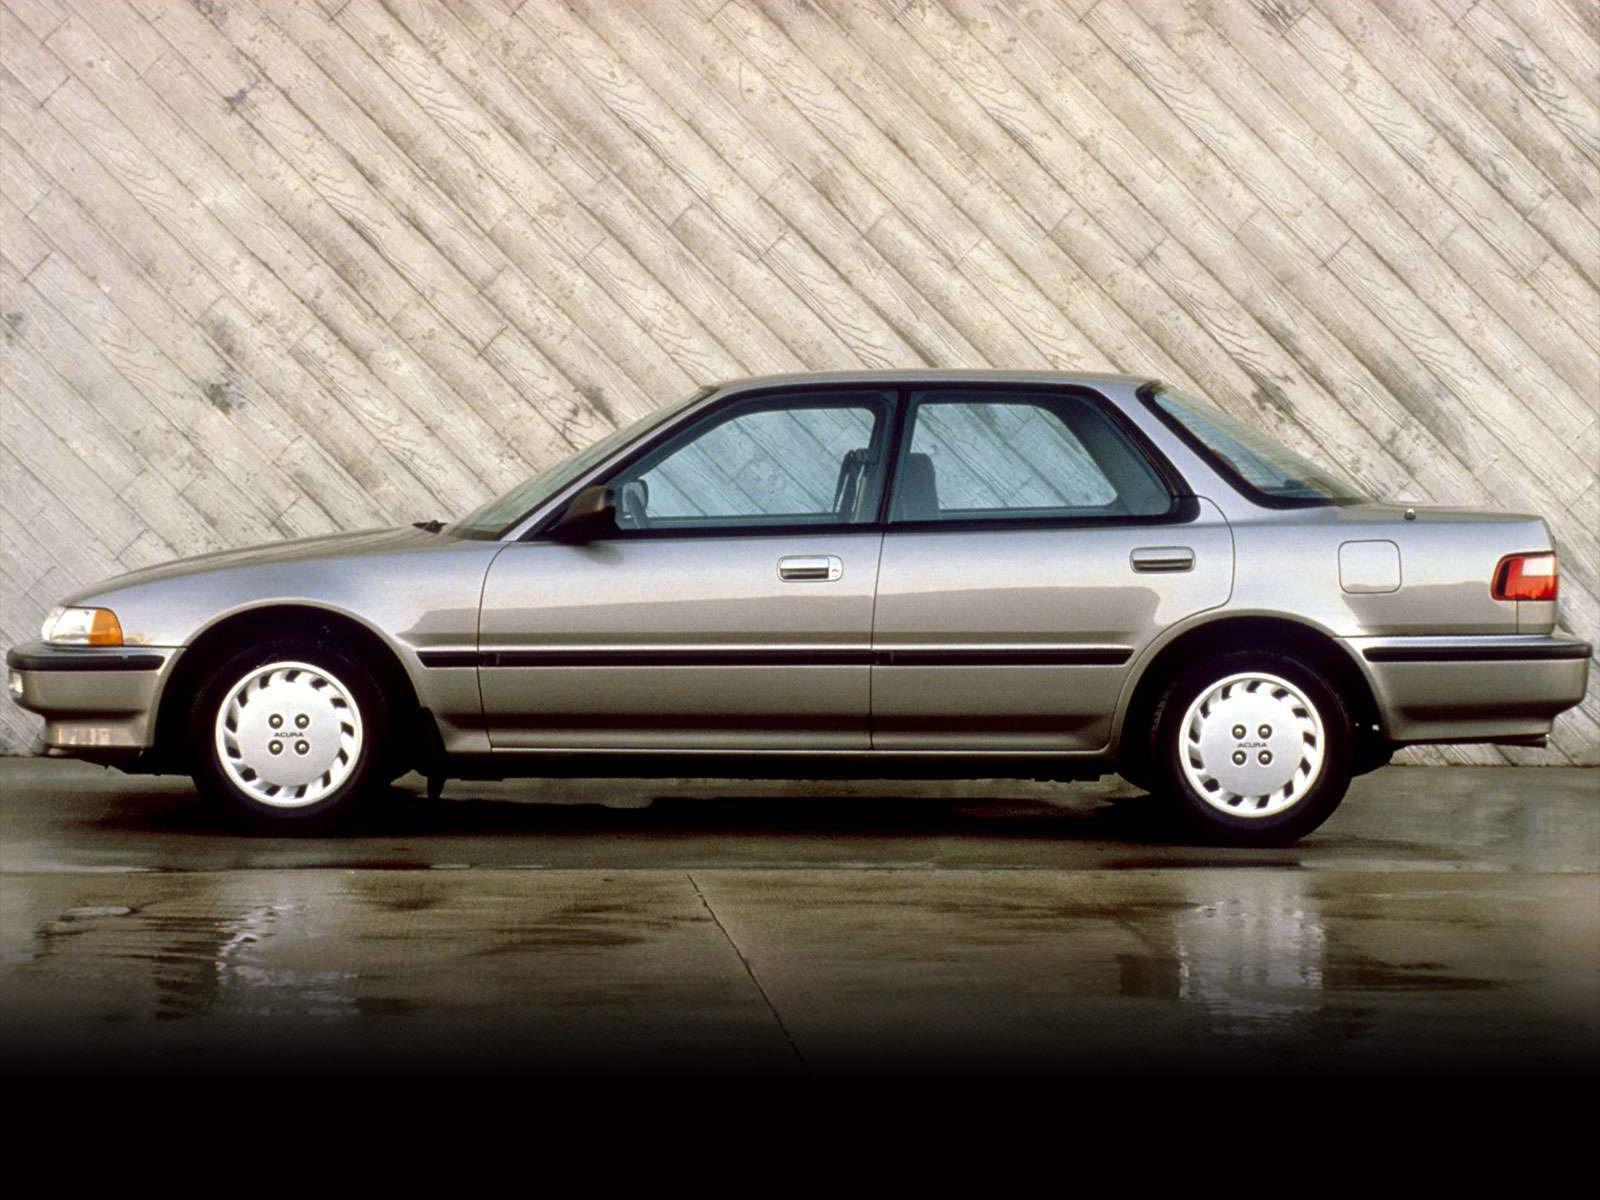 http://1.bp.blogspot.com/-Q2SkzqdmPtg/Tle8wV393QI/AAAAAAAADbw/Whzh0VvYCr0/s1600/Acura-Integra_1990_japanese-car-wallpapers_1.jpg